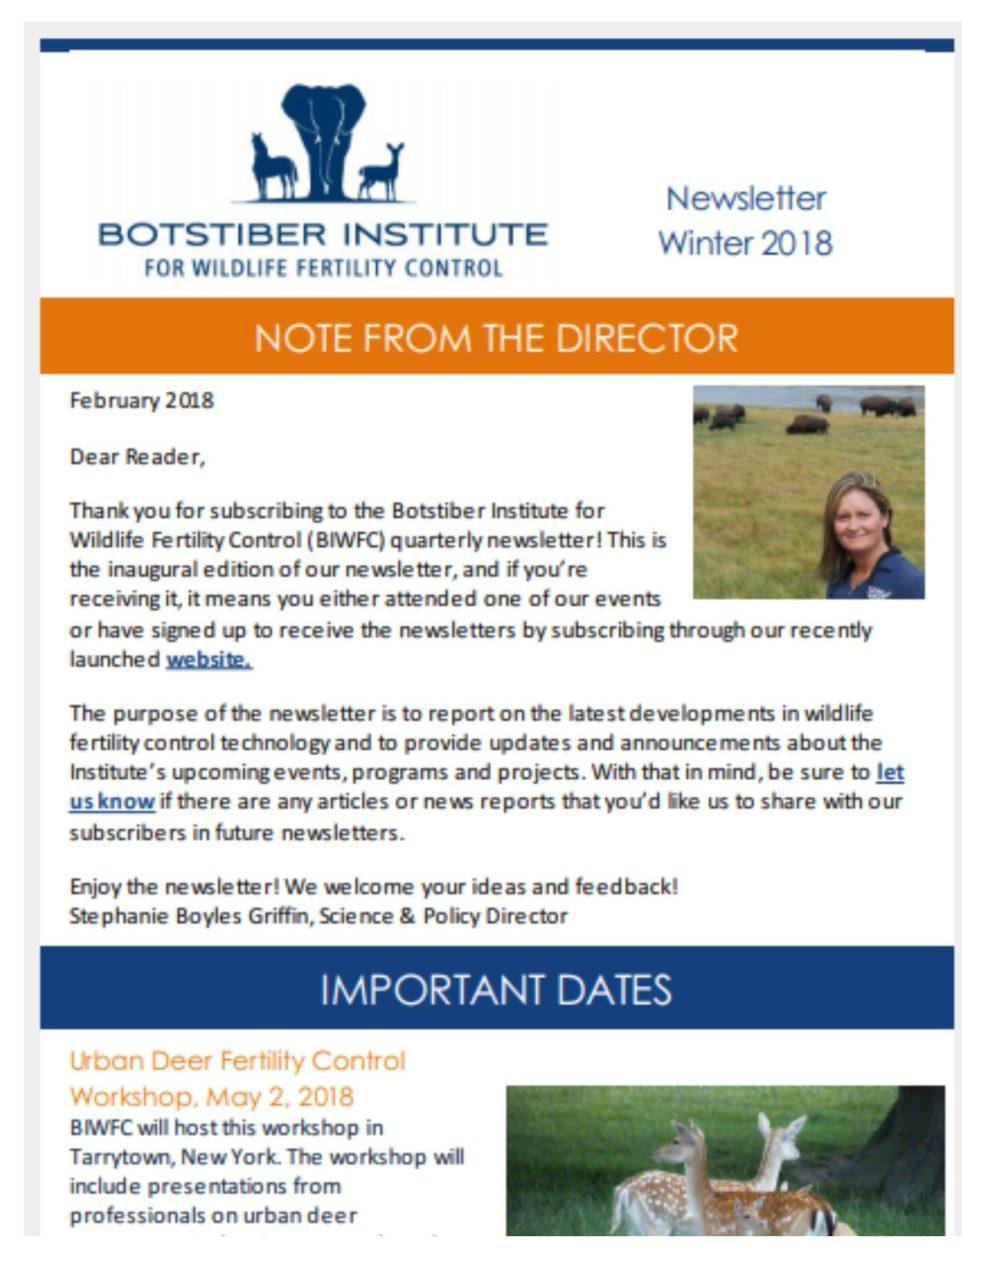 biwfc newsletter botstiber institute for wildlife fertility control